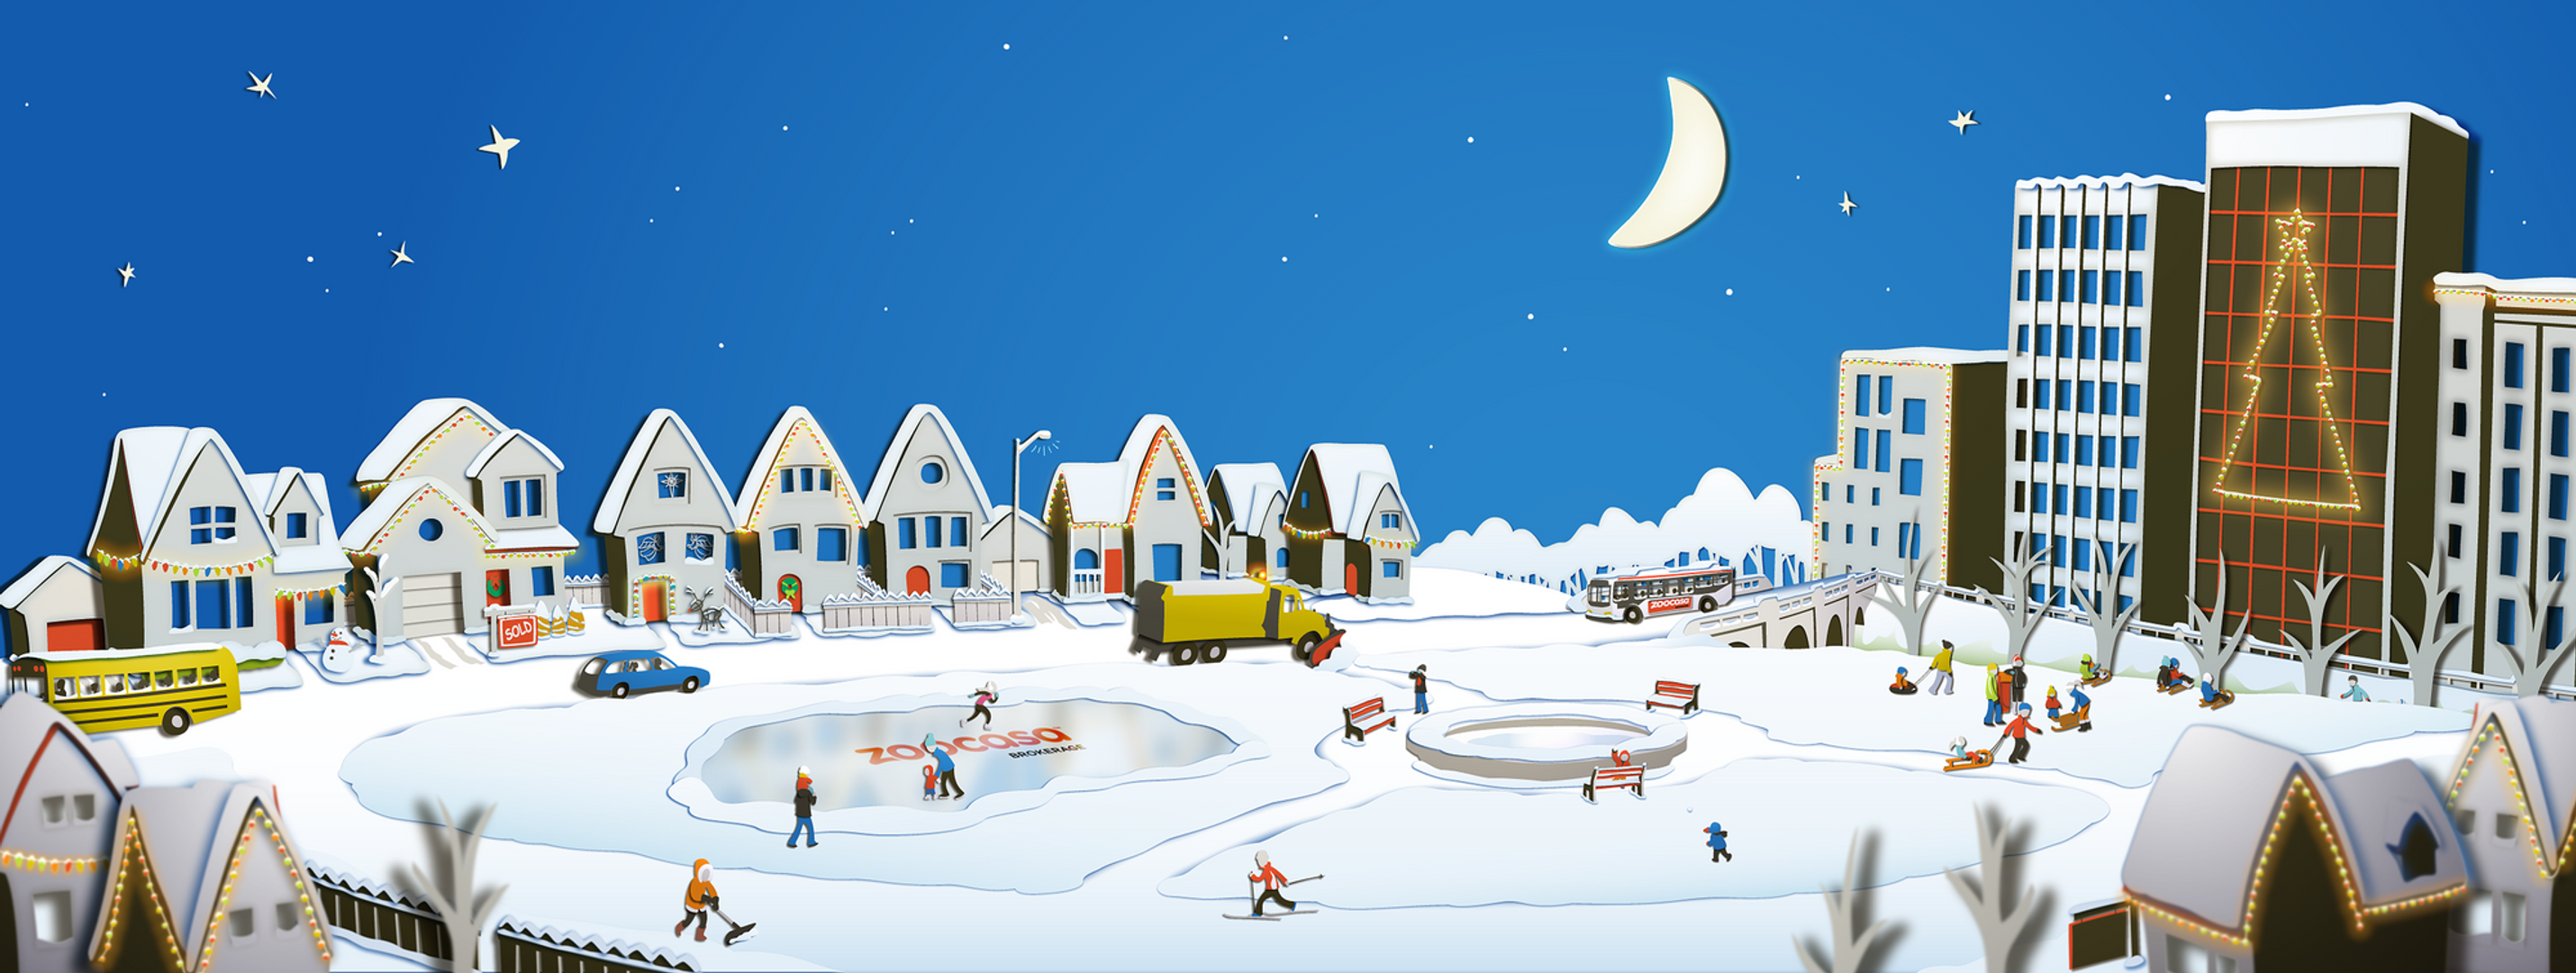 Zoocasa - Winter Landing Page Art